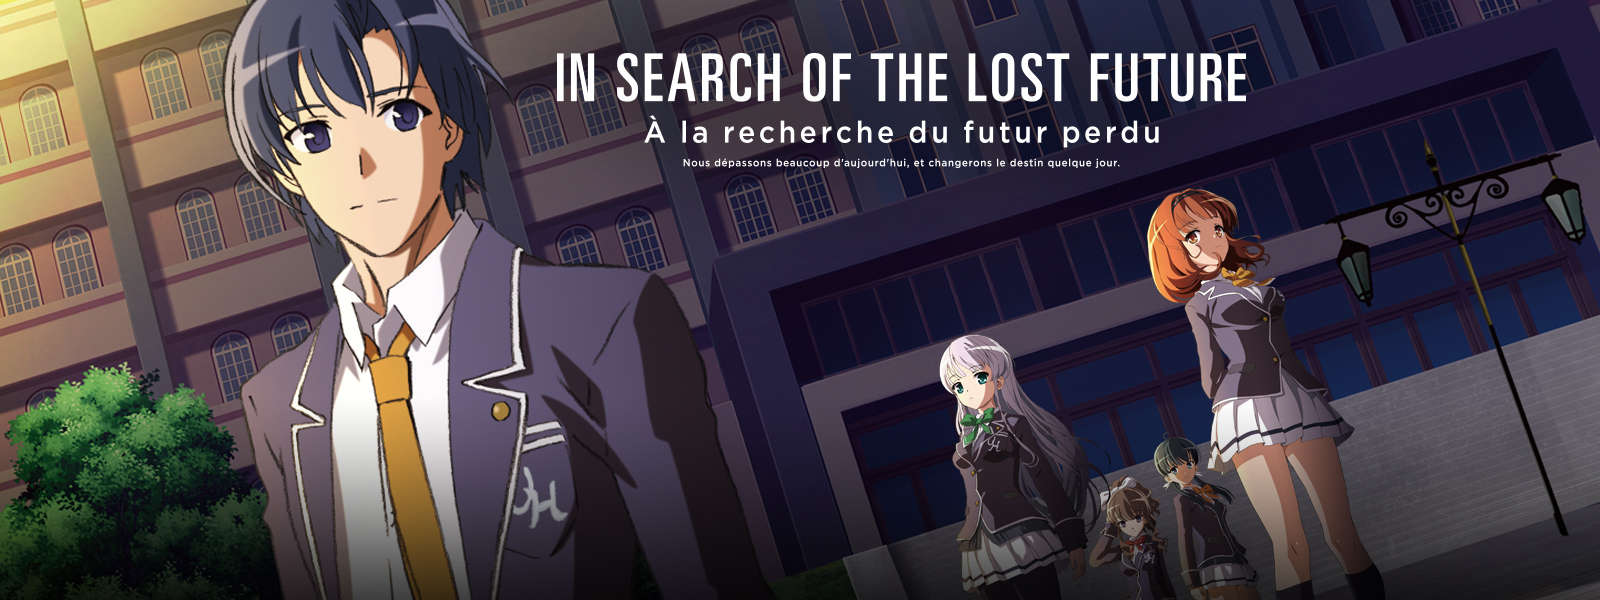 In Search of the Lost Future